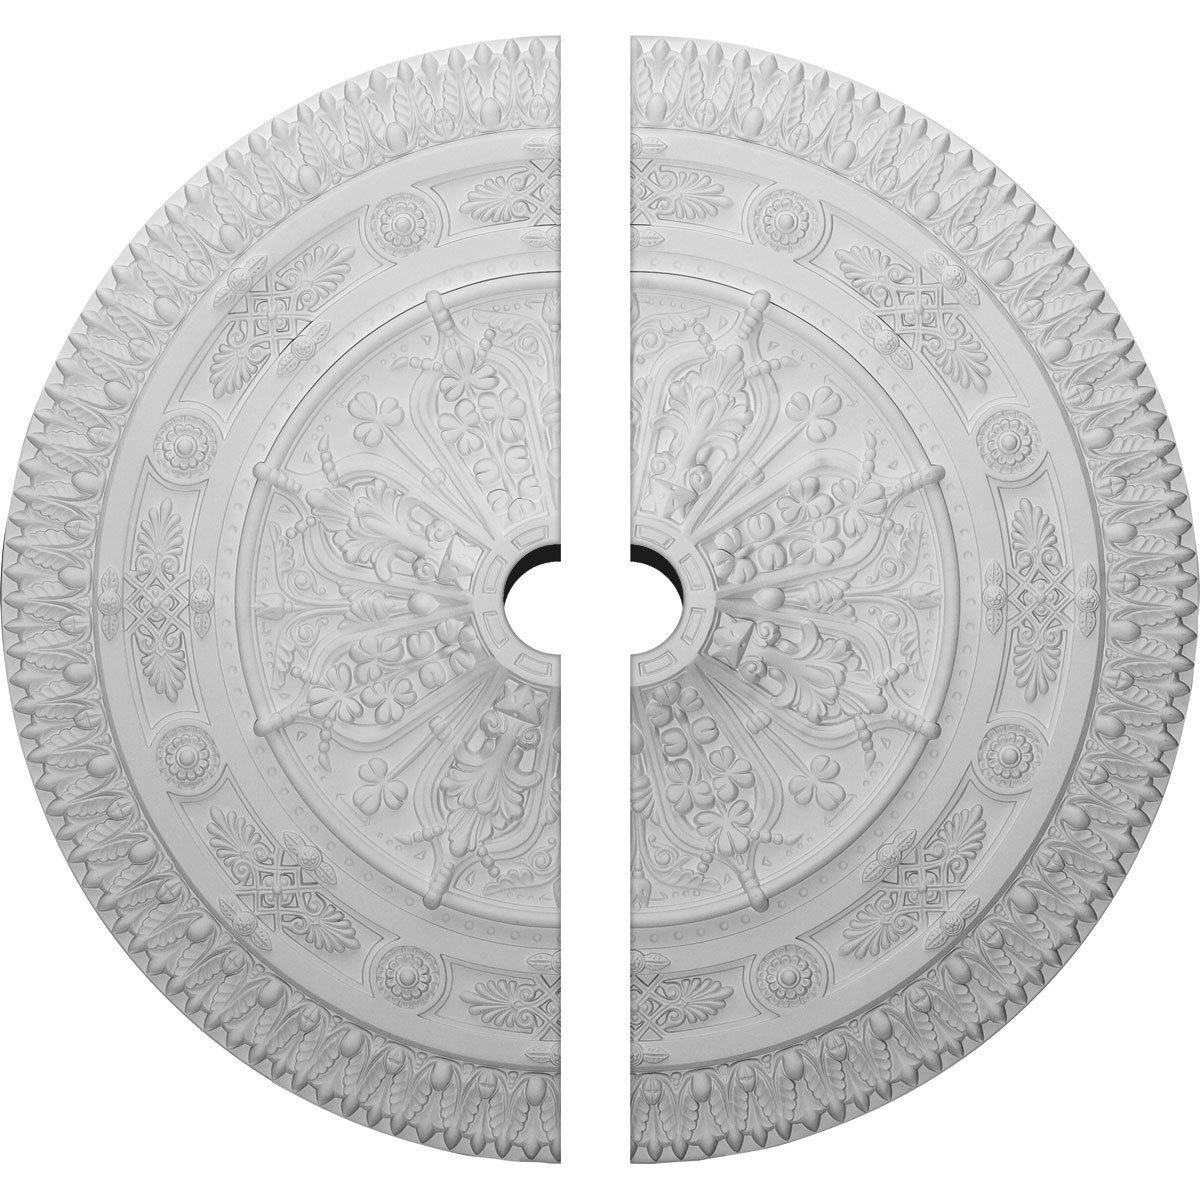 Ekena Millwork CM37NA2-05000 37 1/2''OD x 5''ID x 3 3/8''P Naple Ceiling Medallion, Fits Canopies up to 3-1/2'', 2 Piece